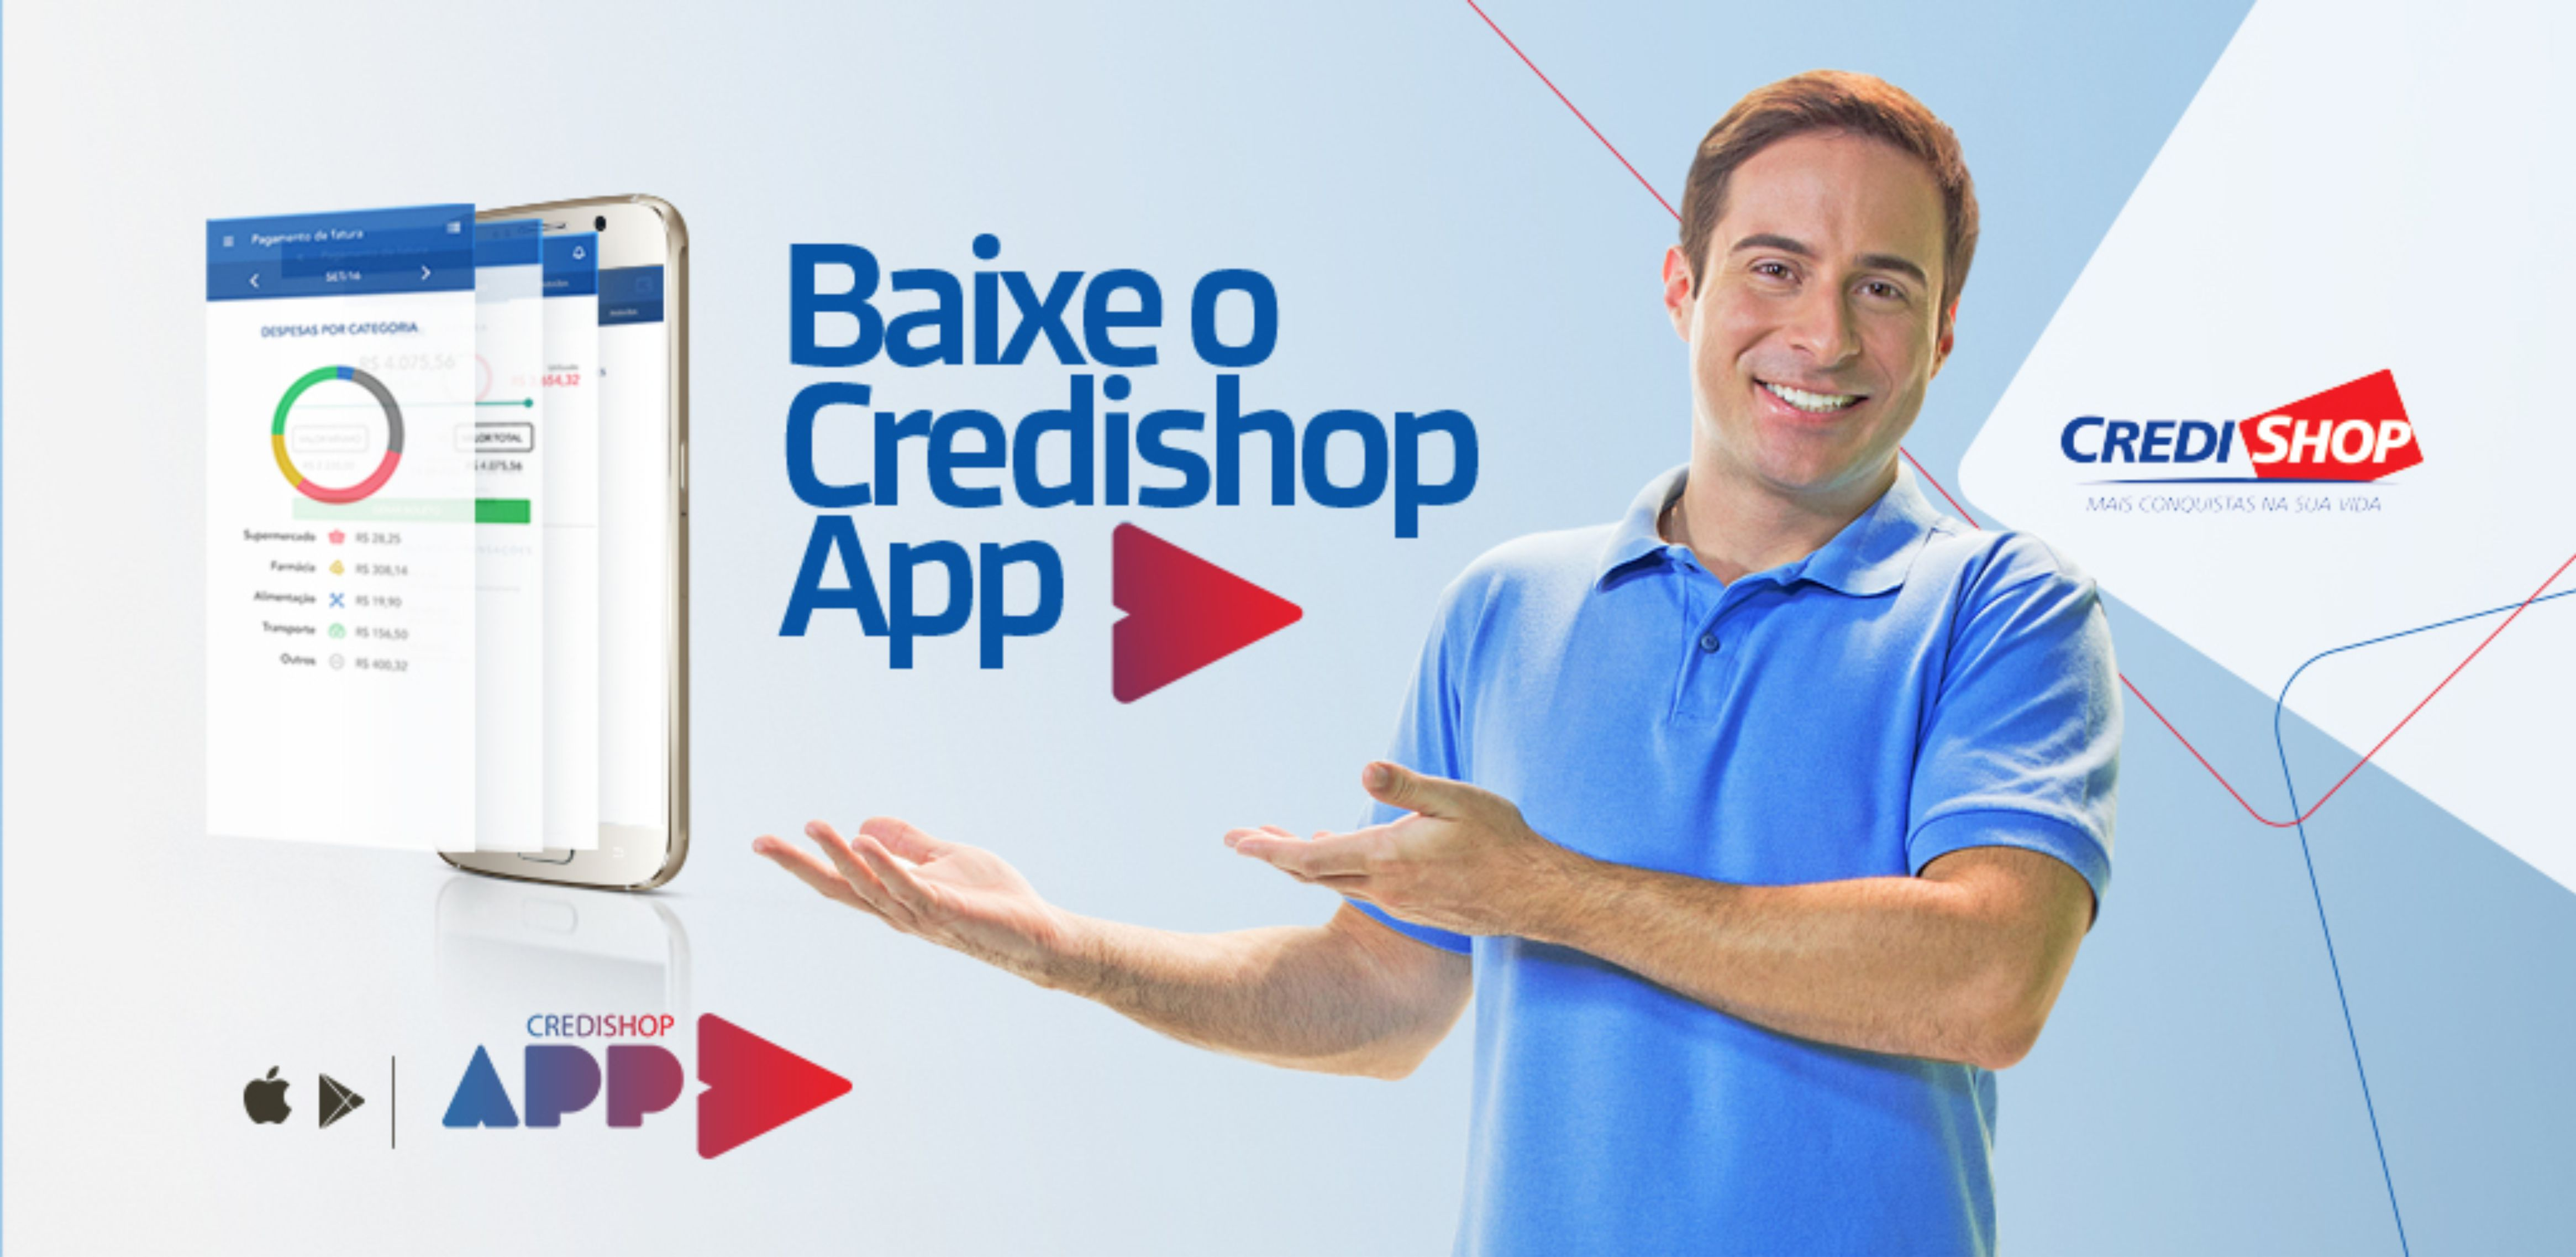 Lançamento Credishop APP